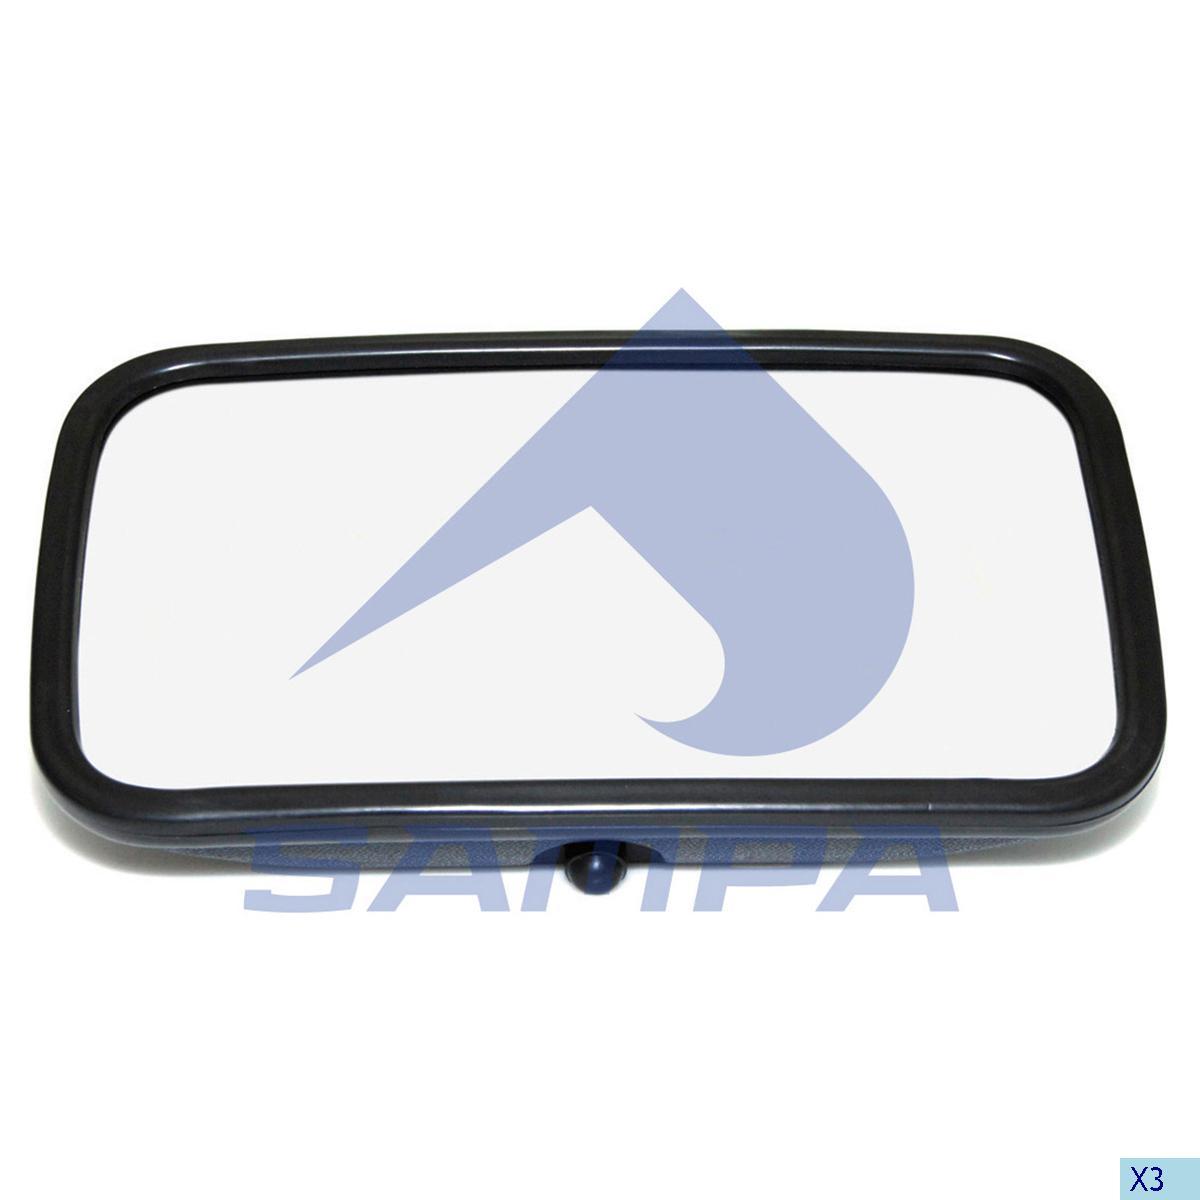 Mirror, Mercedes, Cab